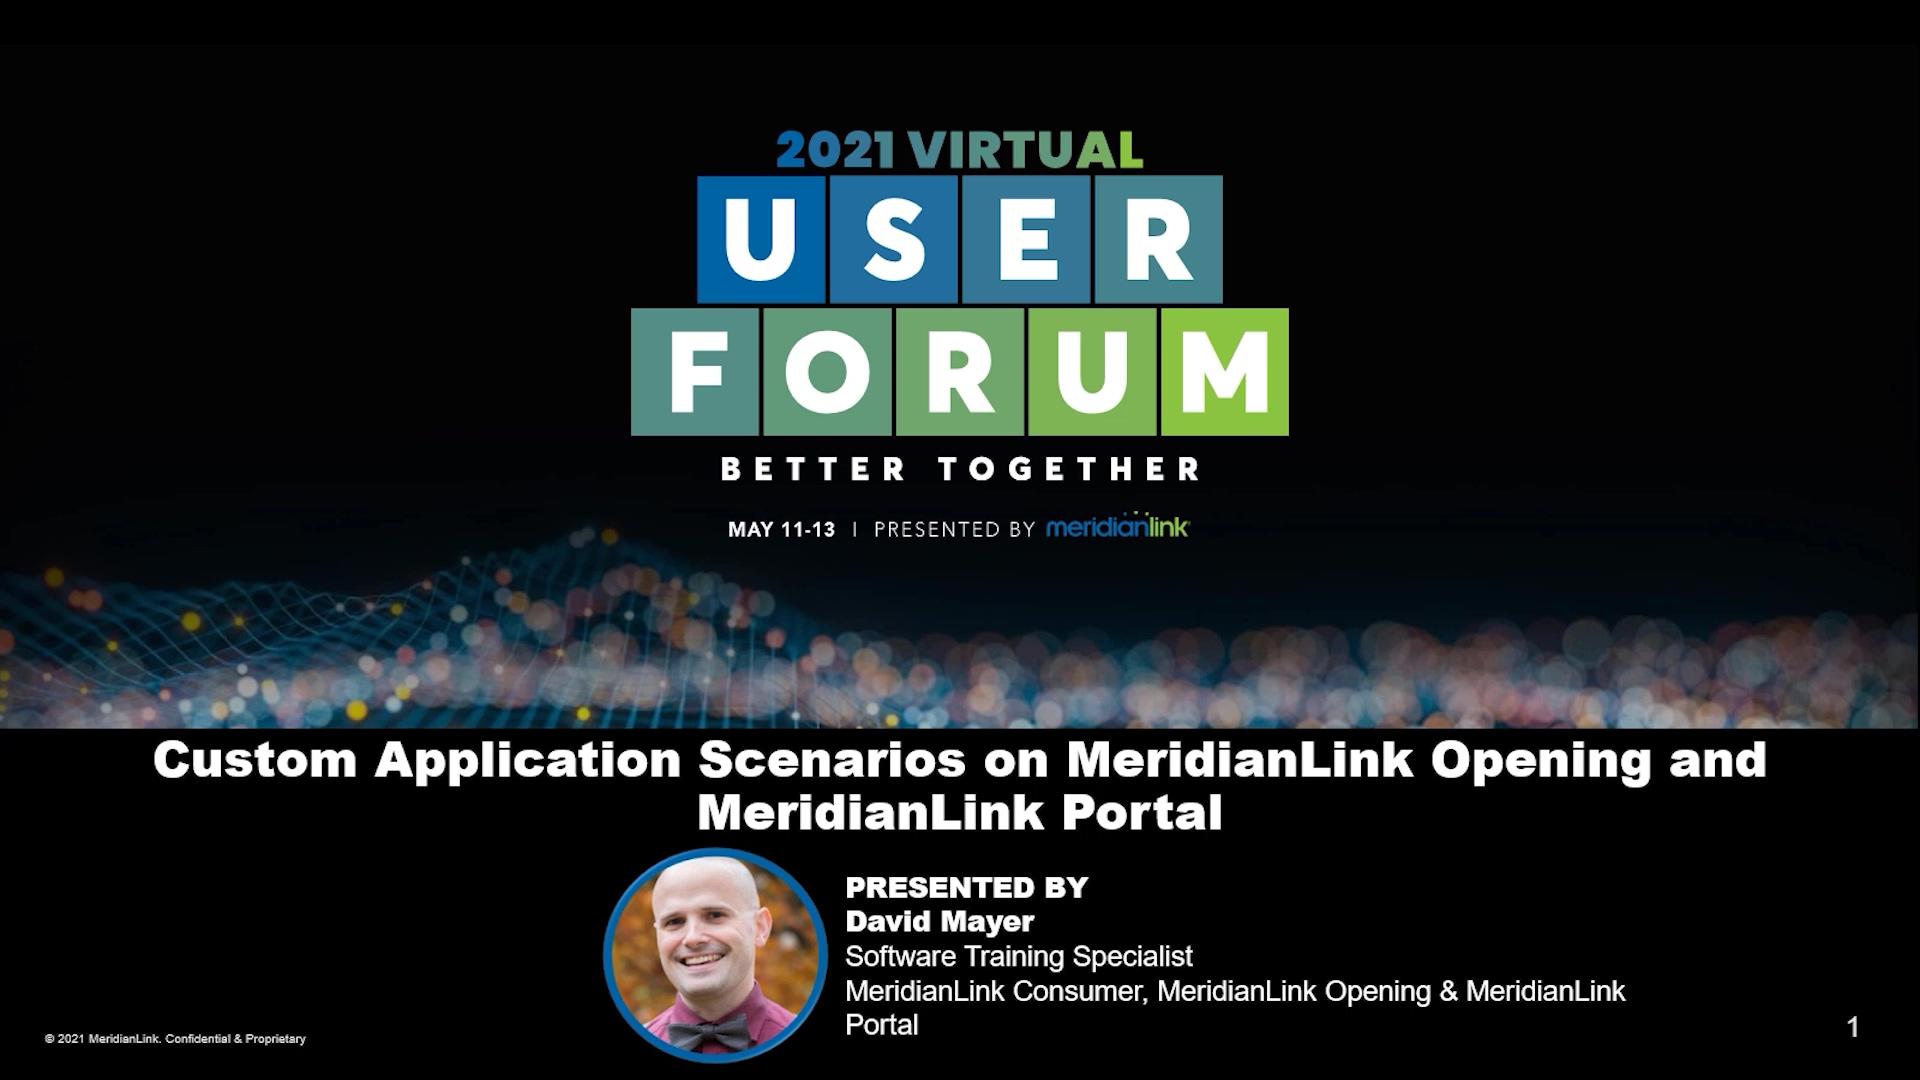 Custom Application Scenarios on MeridianLink Opening and MeridianLink Portal